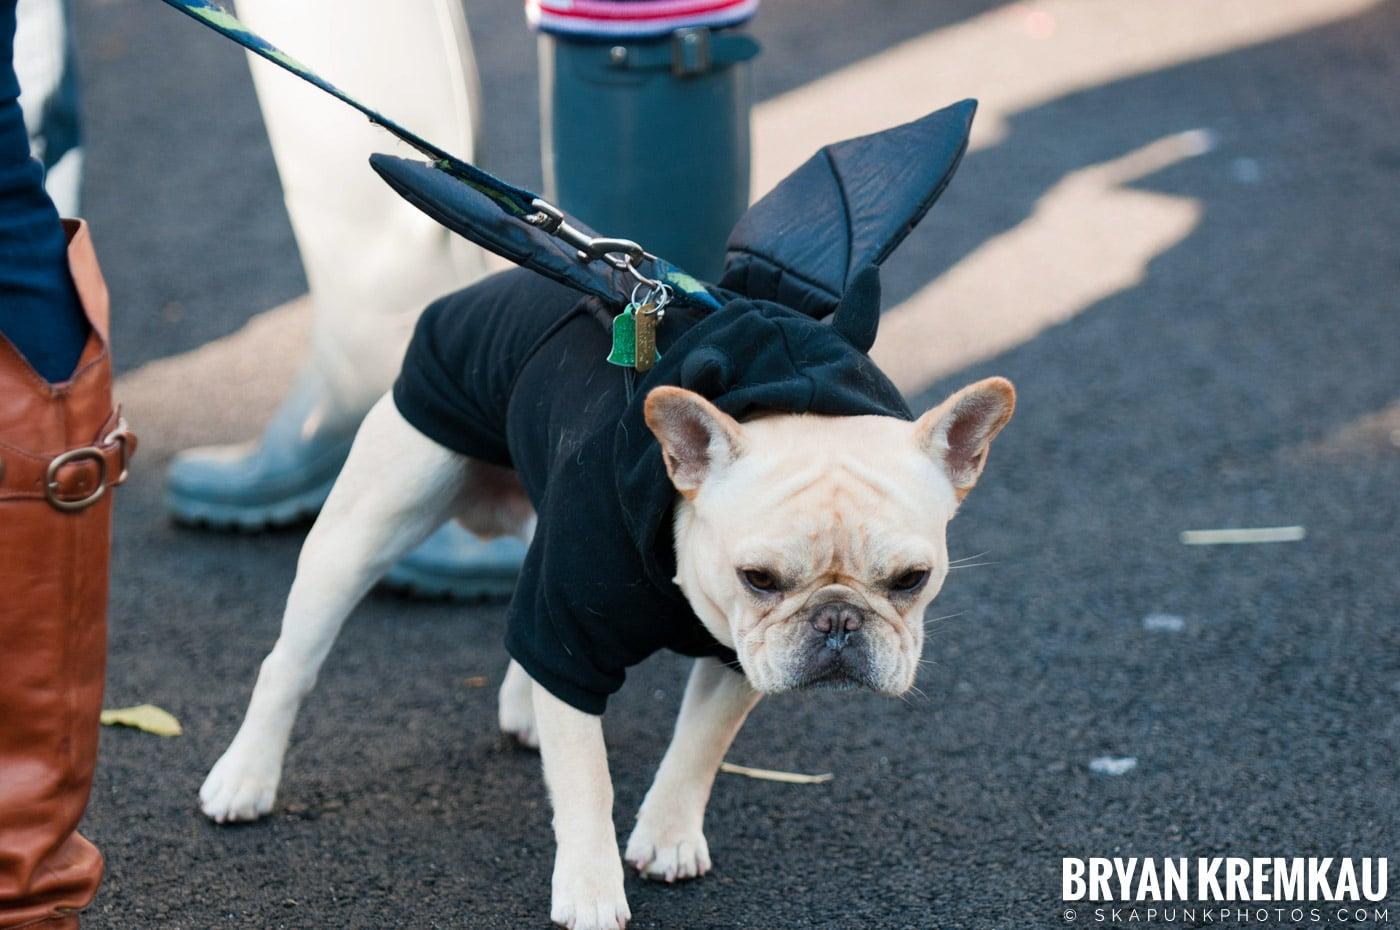 Paulus Hook Halloween Pet Parade 2011 @ Jersey City, NJ - 10.30.11 (71)